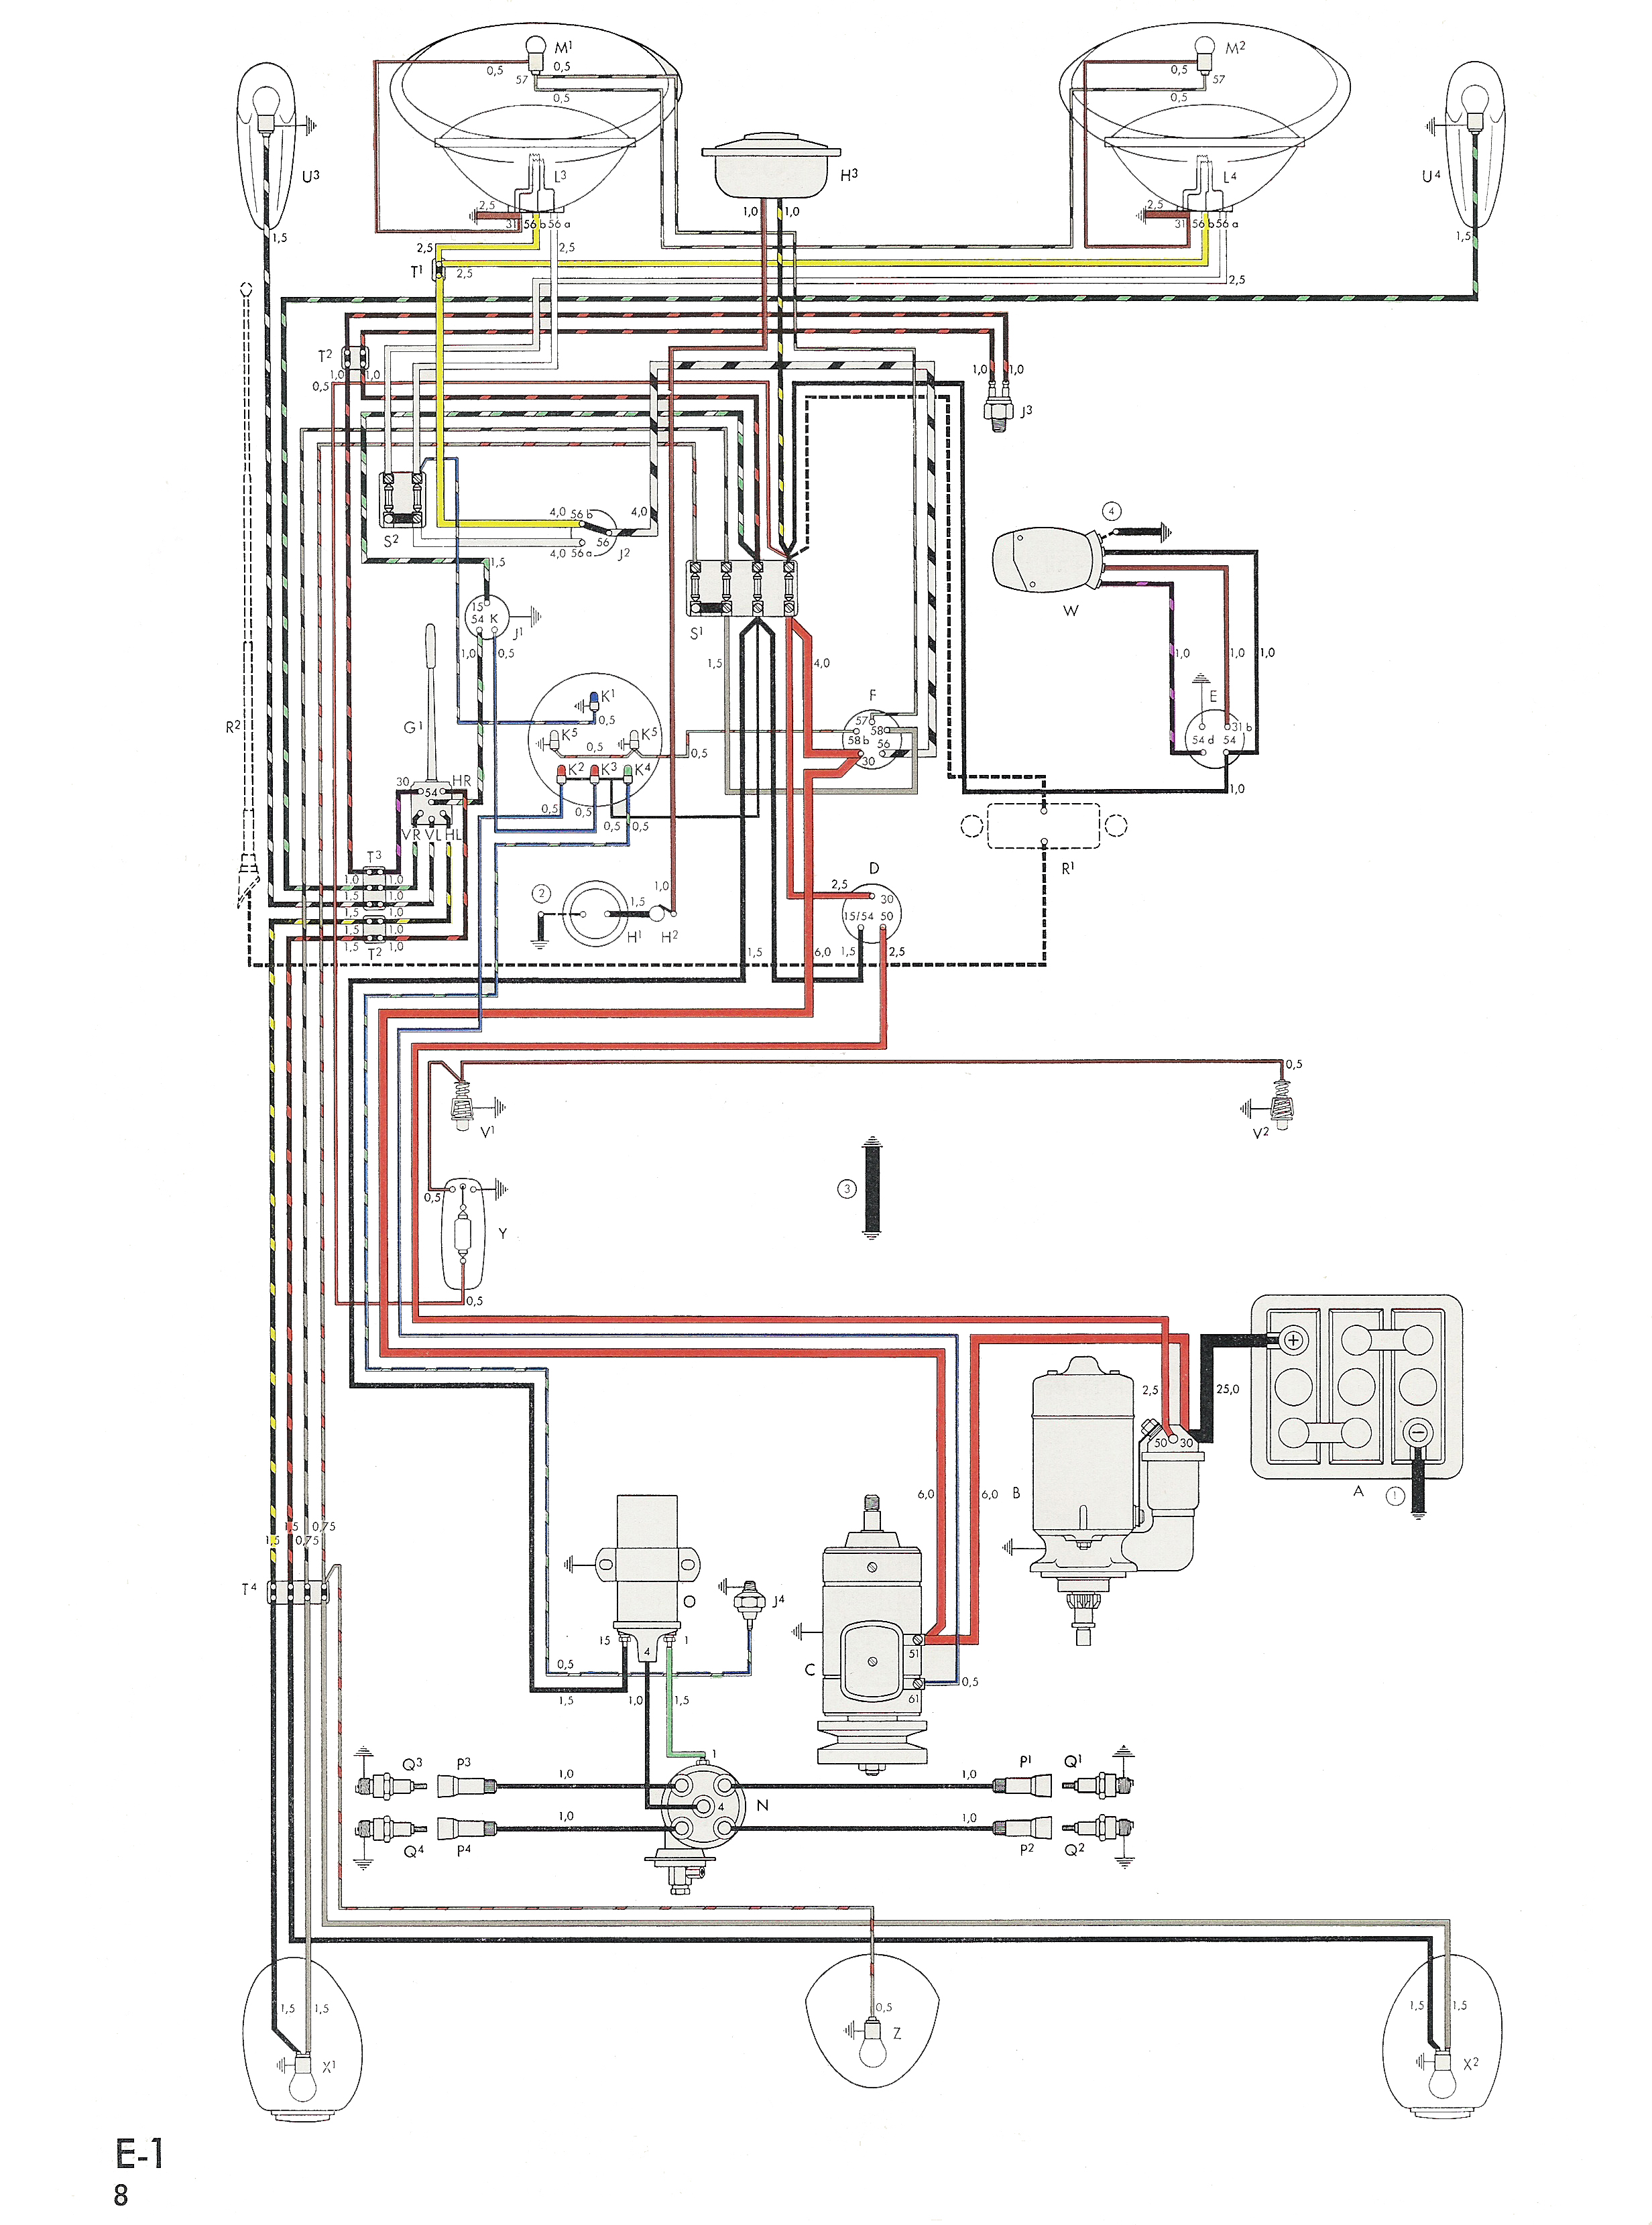 raytheon rs120 gps wiring diagram 8 18 stromoeko de \u2022raytheon rs120 gps wiring diagram wiring library rh 9 m33labs com basic ford solenoid wiring diagram garmin gps wiring diagram